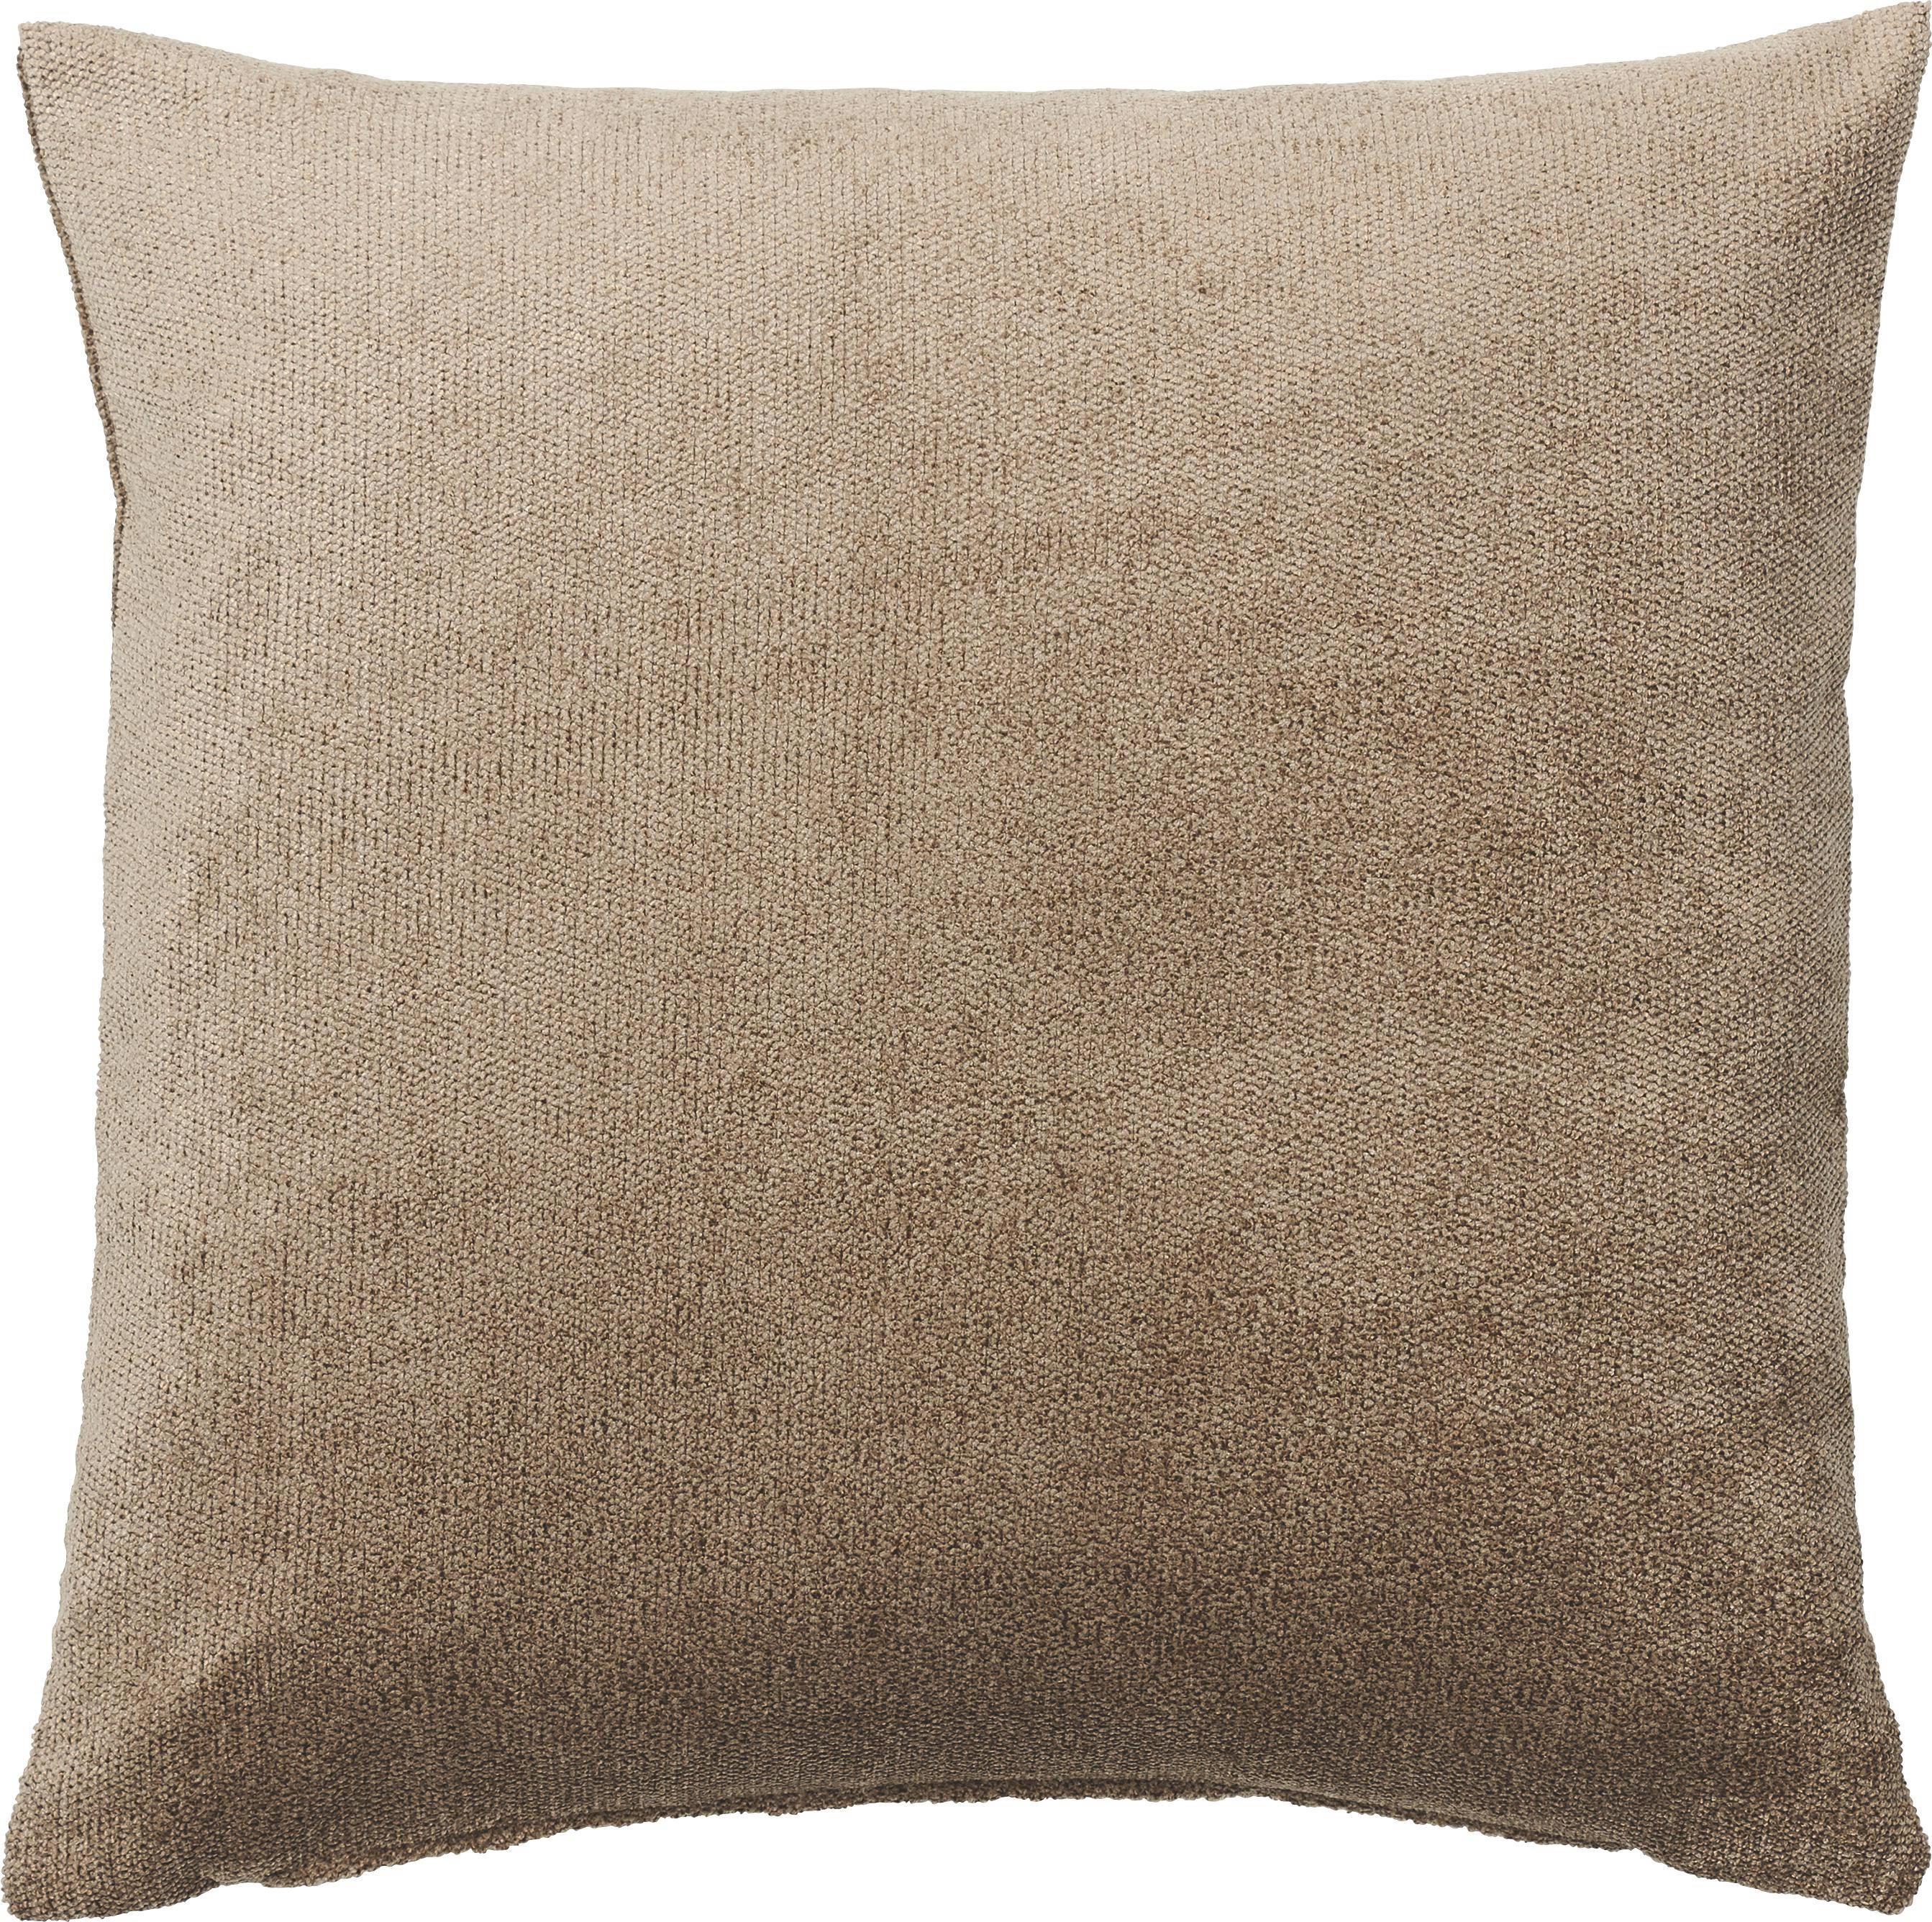 KISSENHÜLLE Taupe 50/50 cm - Taupe, Basics, Textil (50/50cm)